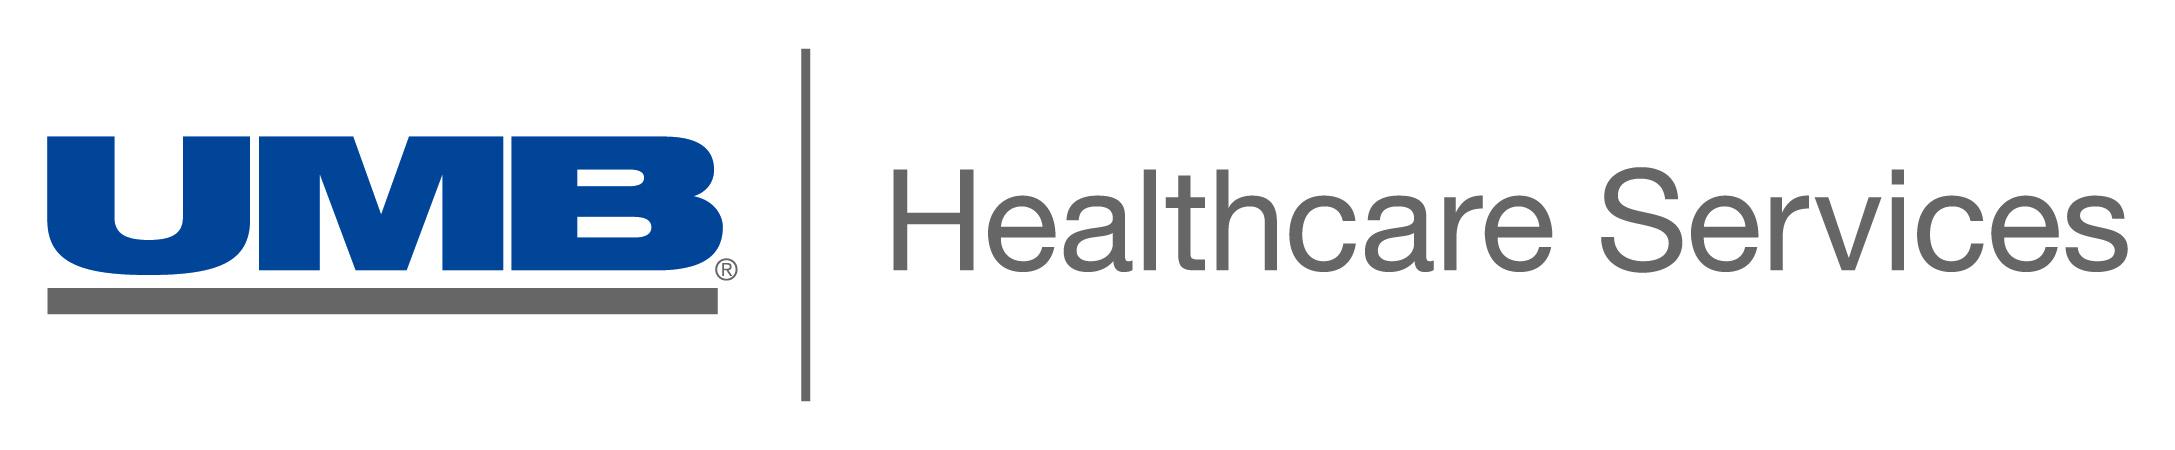 UMB_HealthcareServices logo.jpg